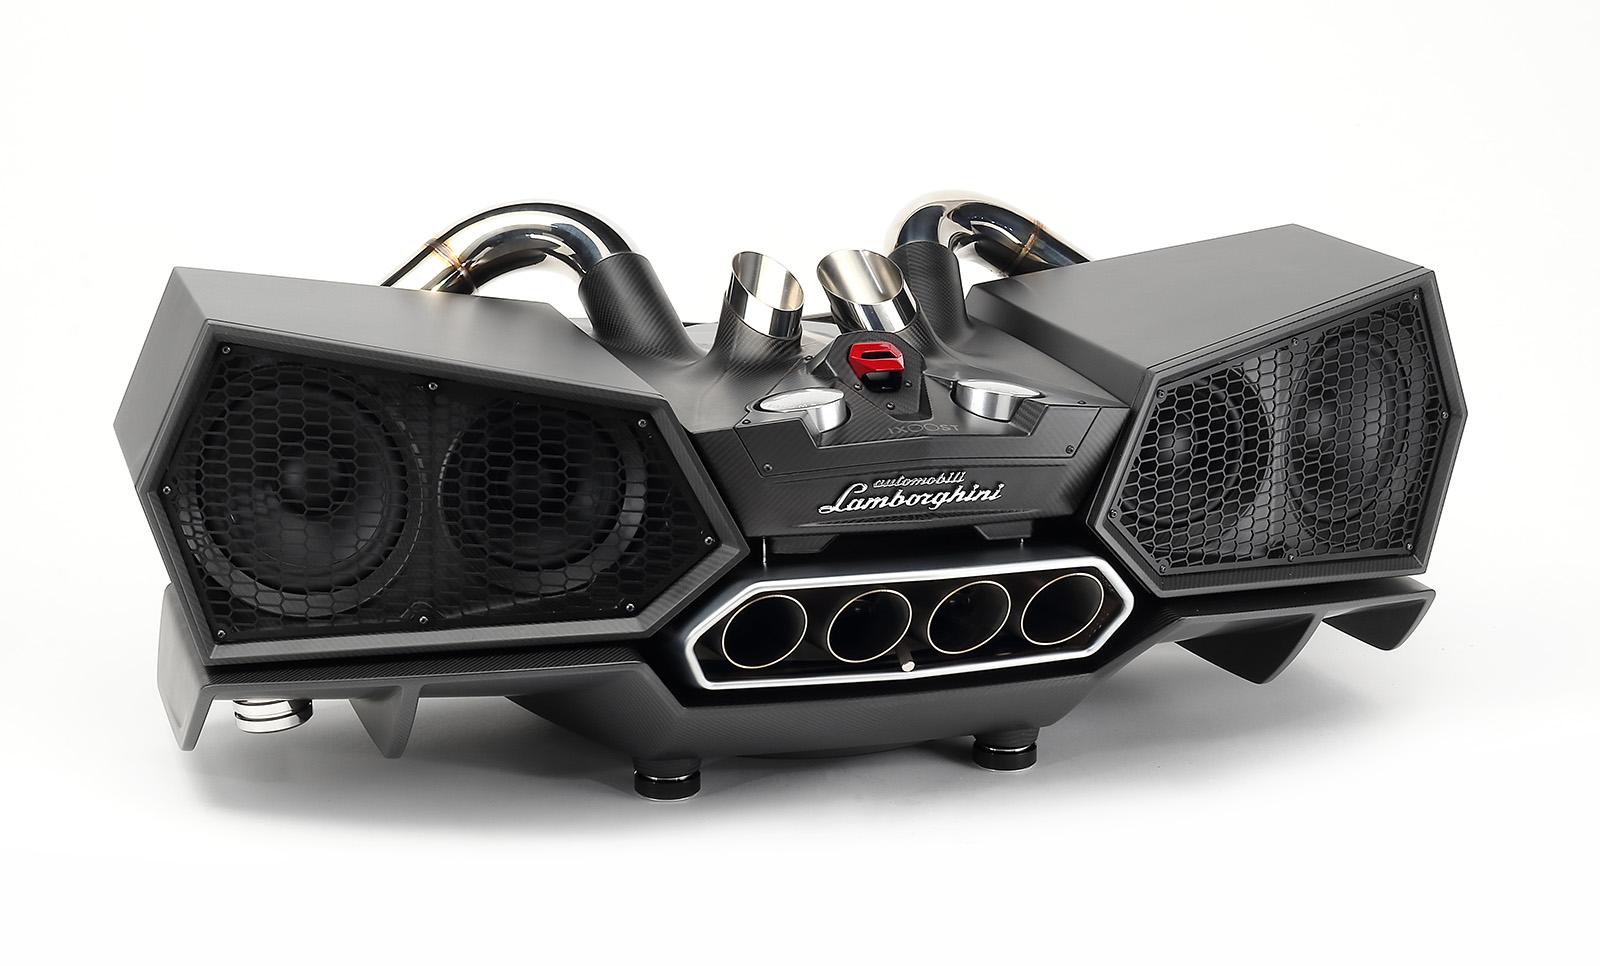 Esavox Carbon Fibre Docking Station Speaker